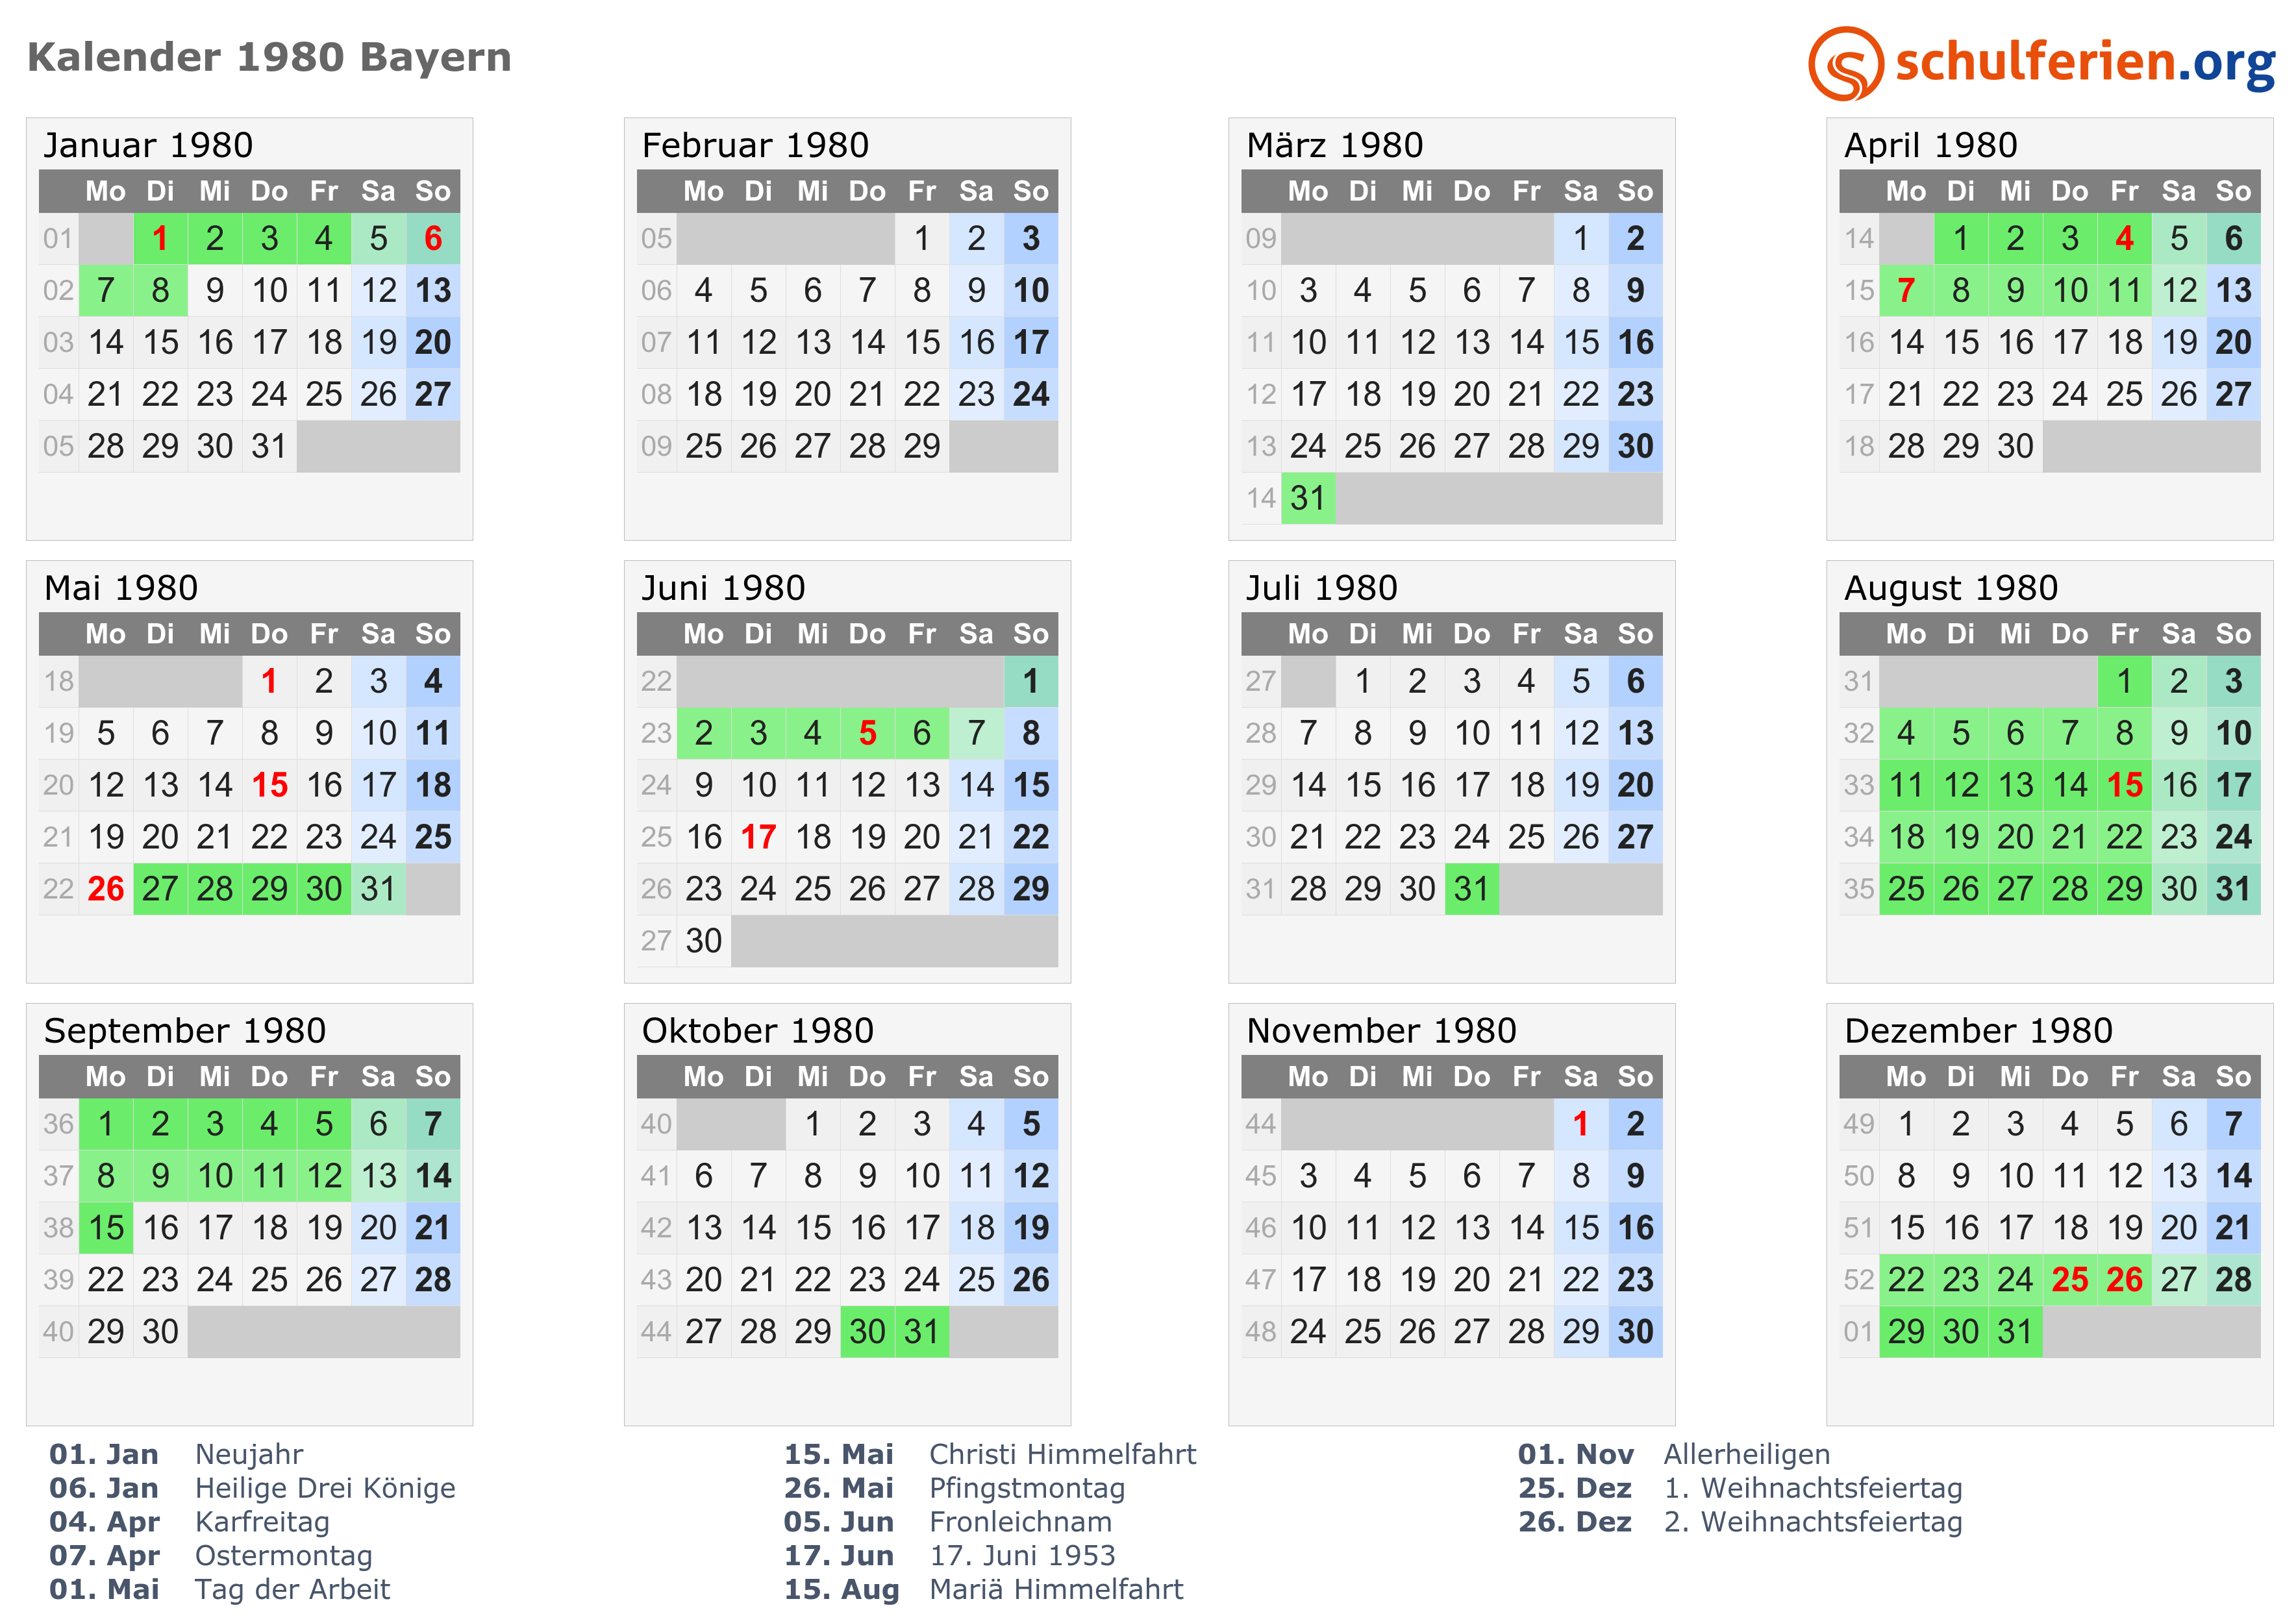 kalender 1980